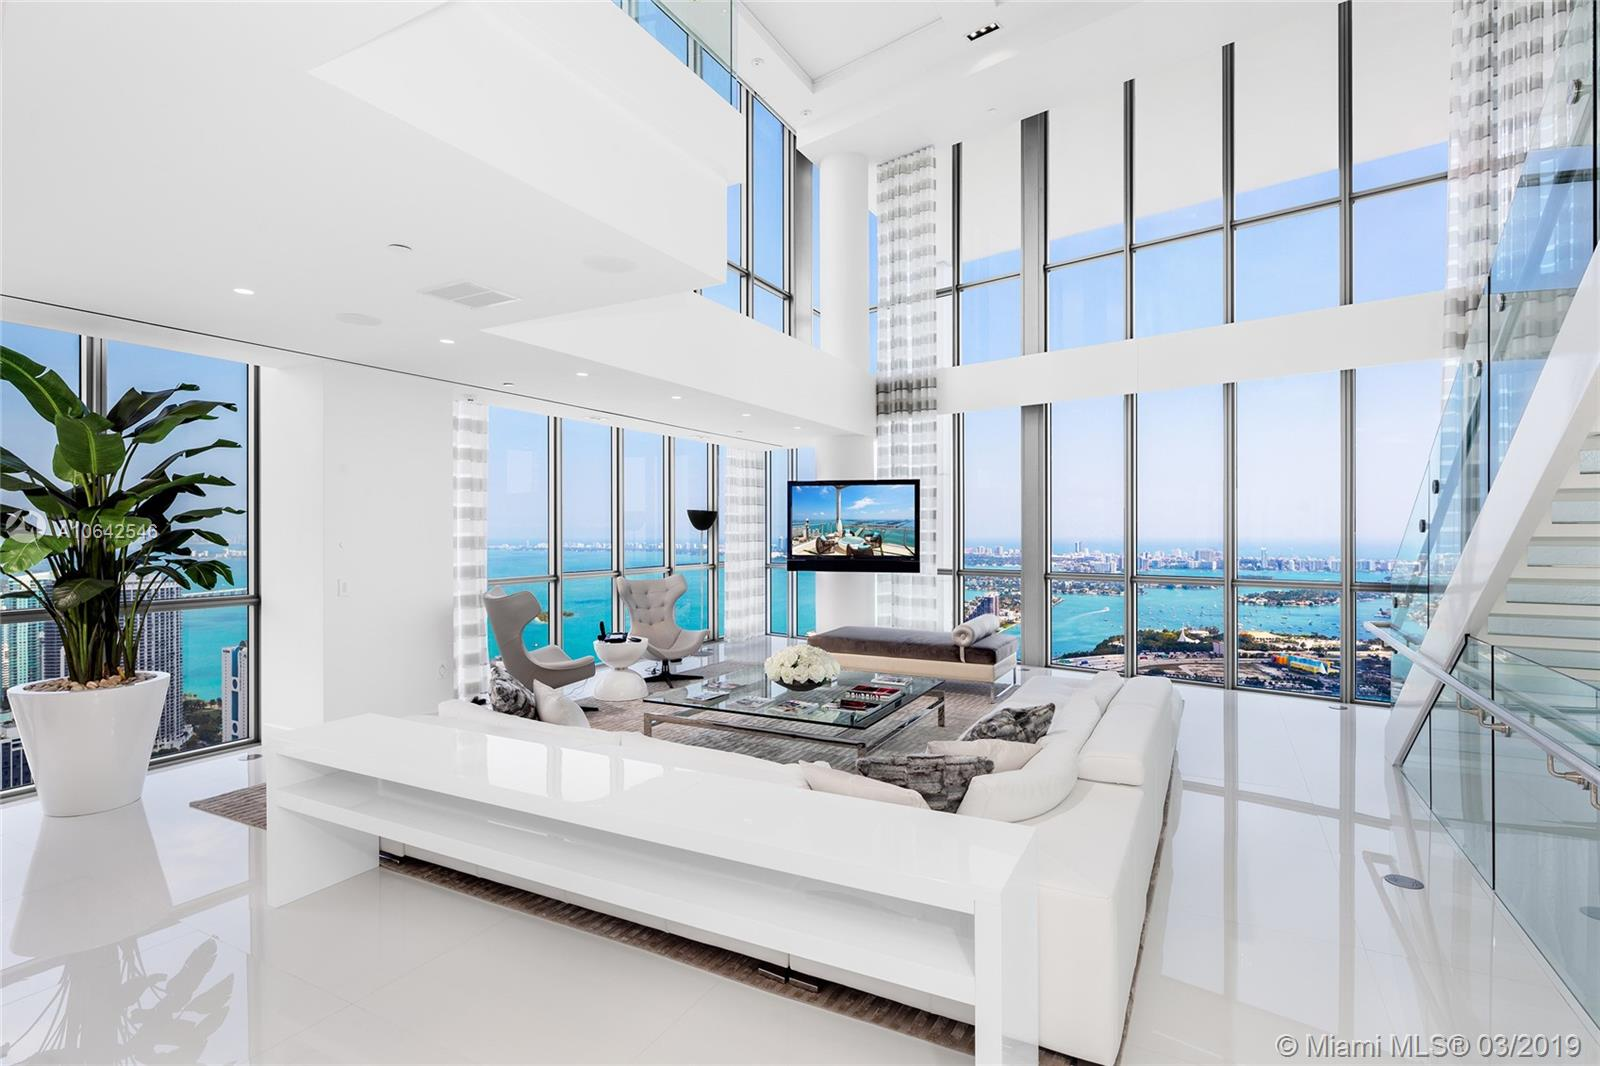 image #1 of property, Marquis Condo, Unit 6401